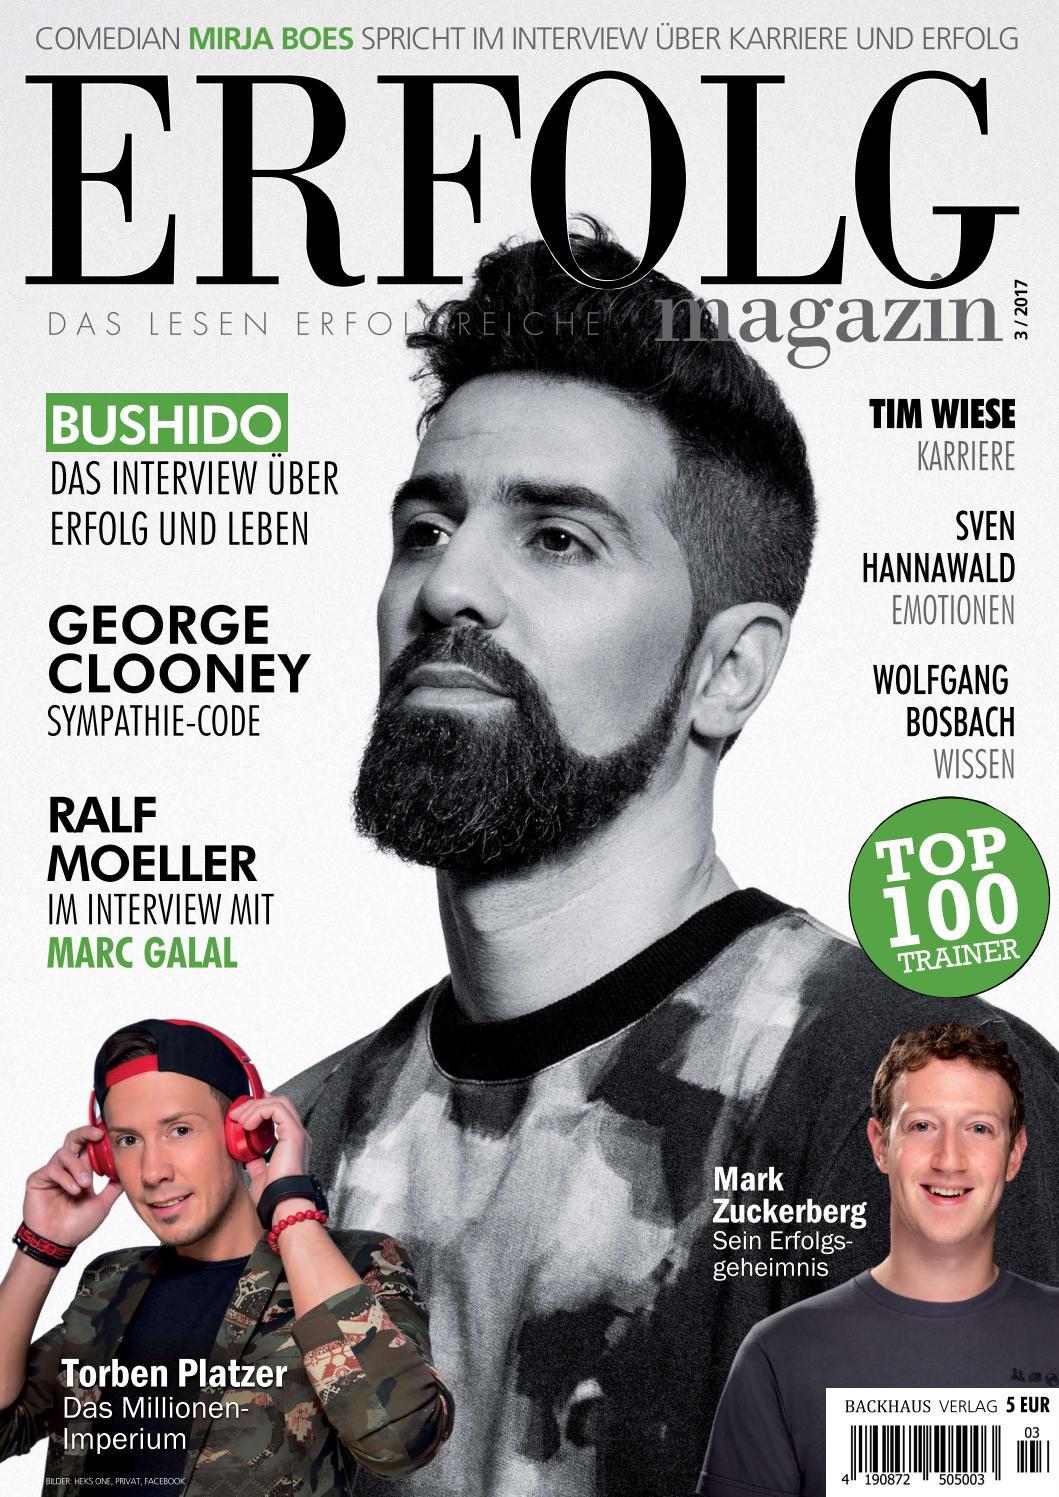 Erfolg Magazin, Ausgabe 3-2017 by ERFOLG Magazin - issuu